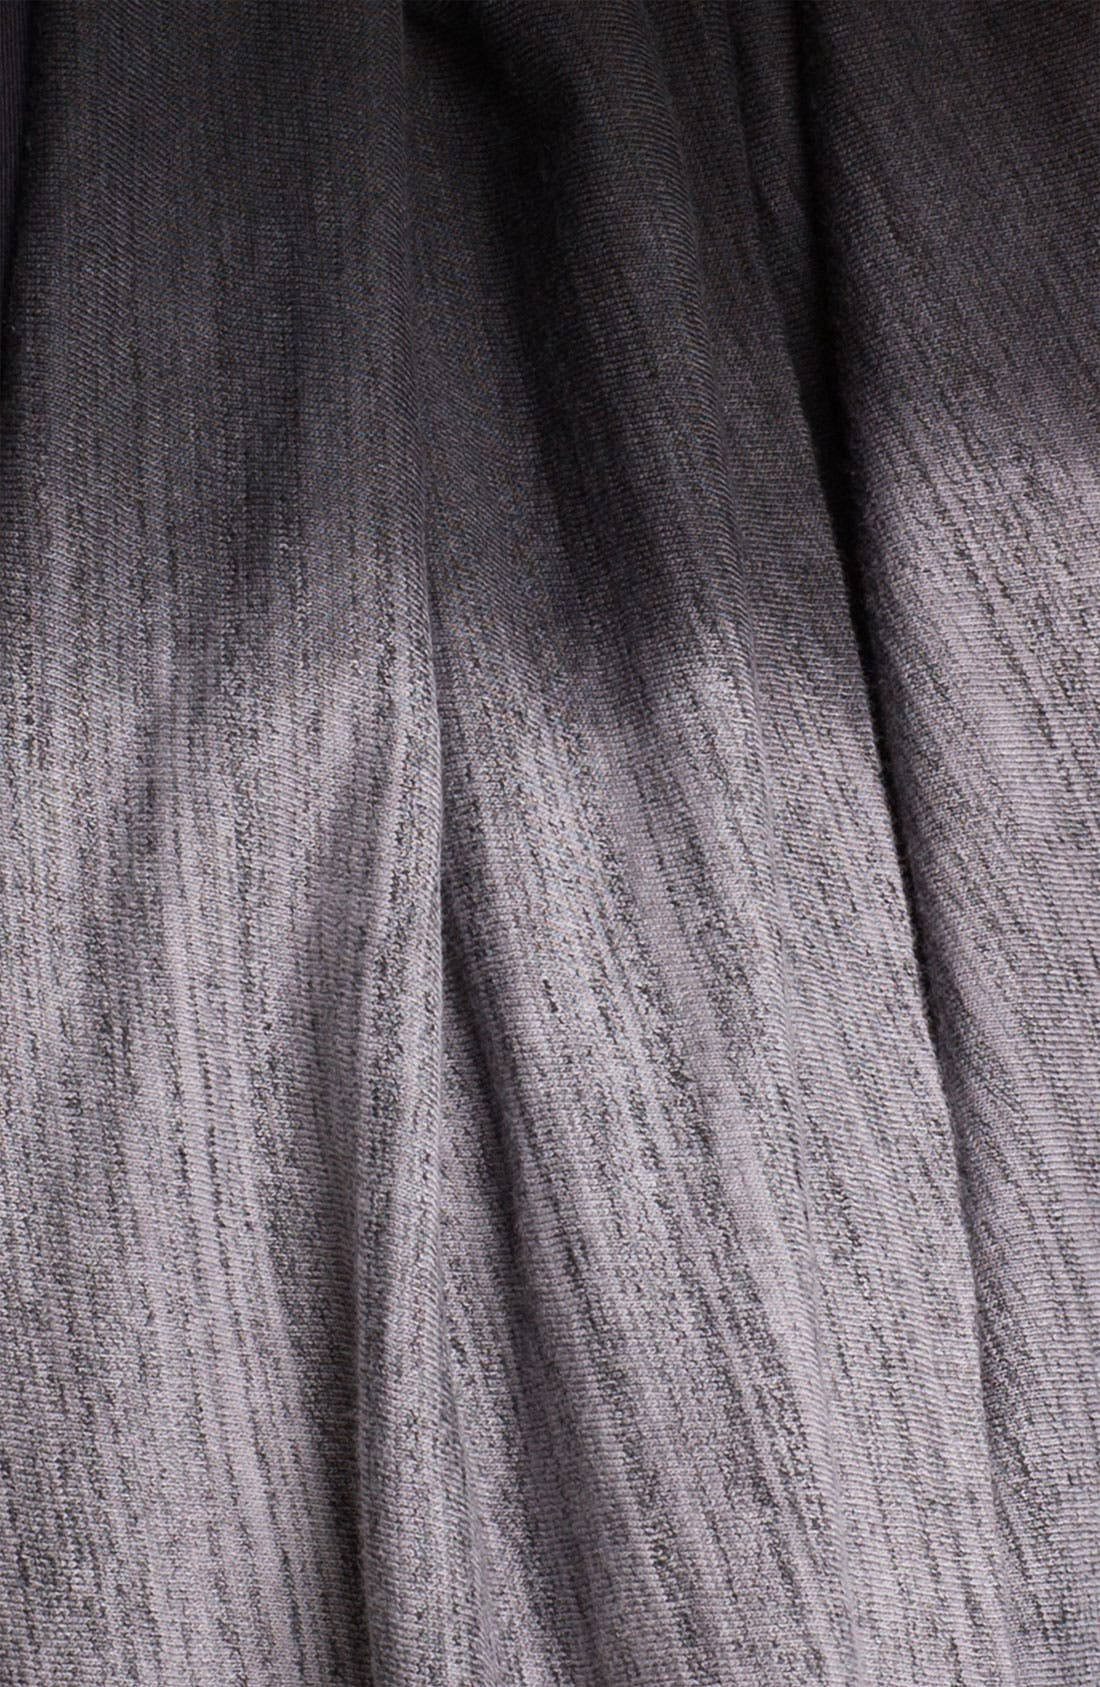 Alternate Image 2  - Pure Karma Dip Dye Infinity Scarf